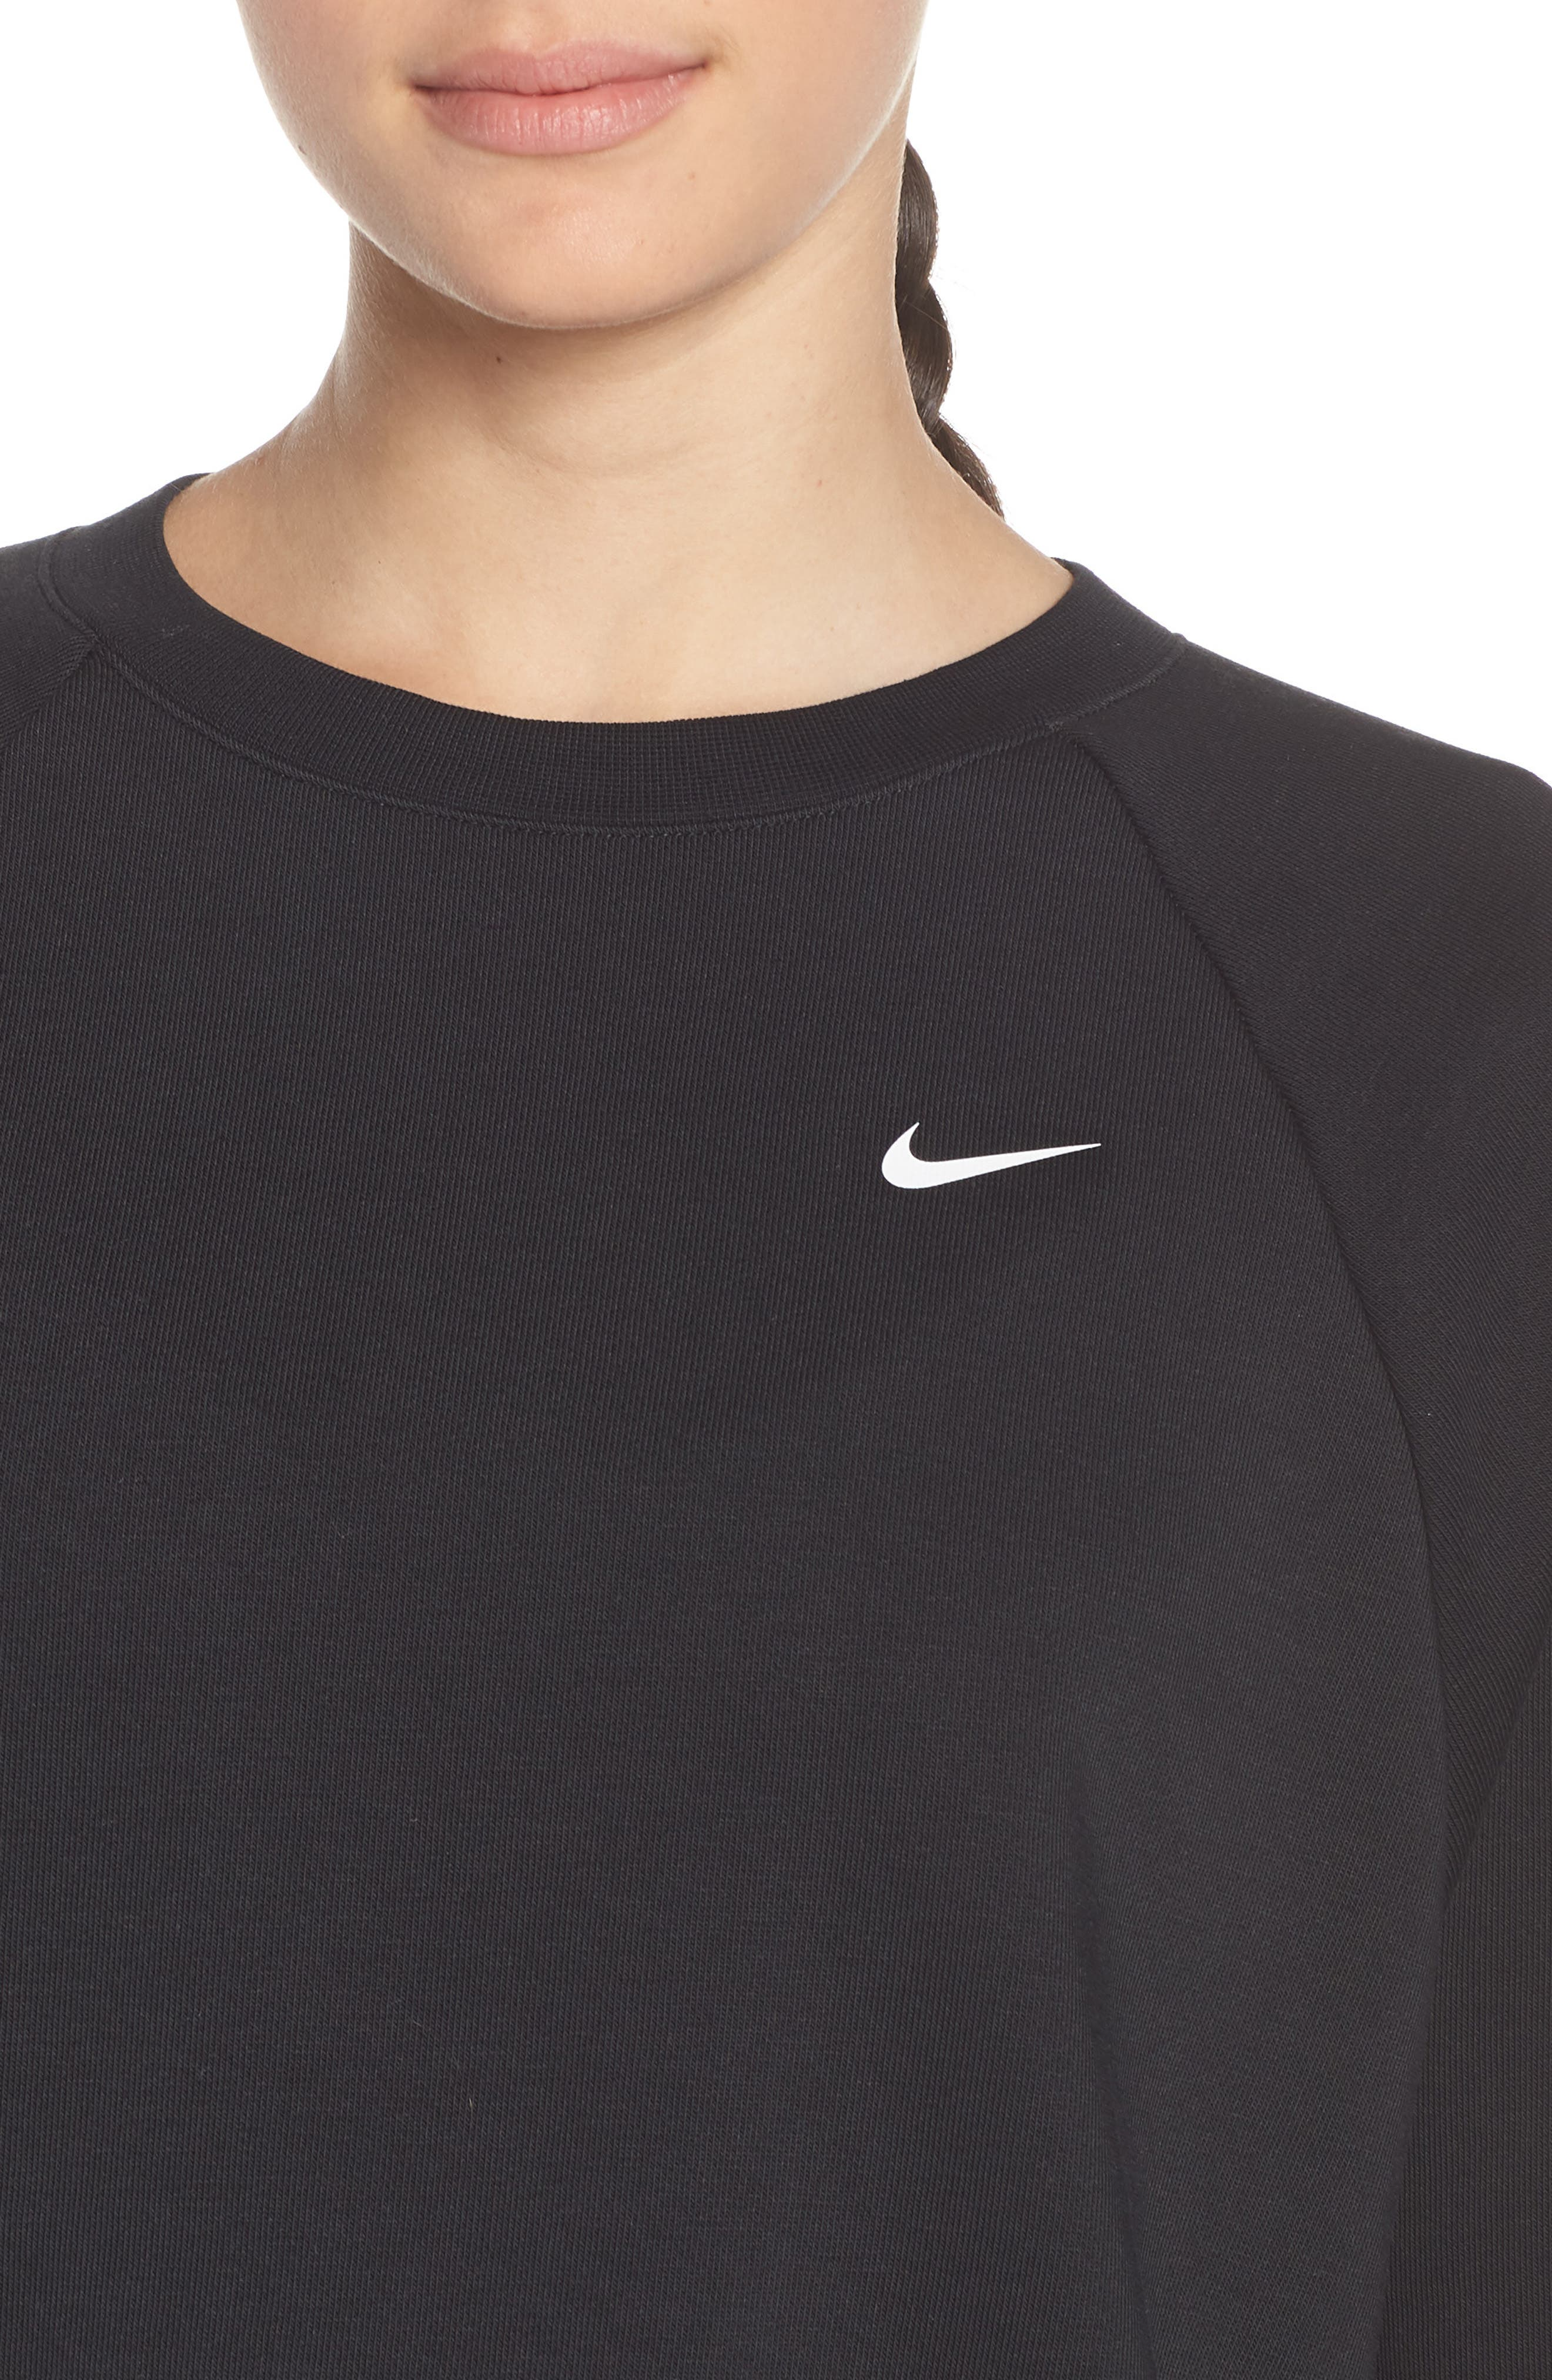 NIKE, Dry Crop Training Sweatshirt, Alternate thumbnail 5, color, BLACK/ WHITE